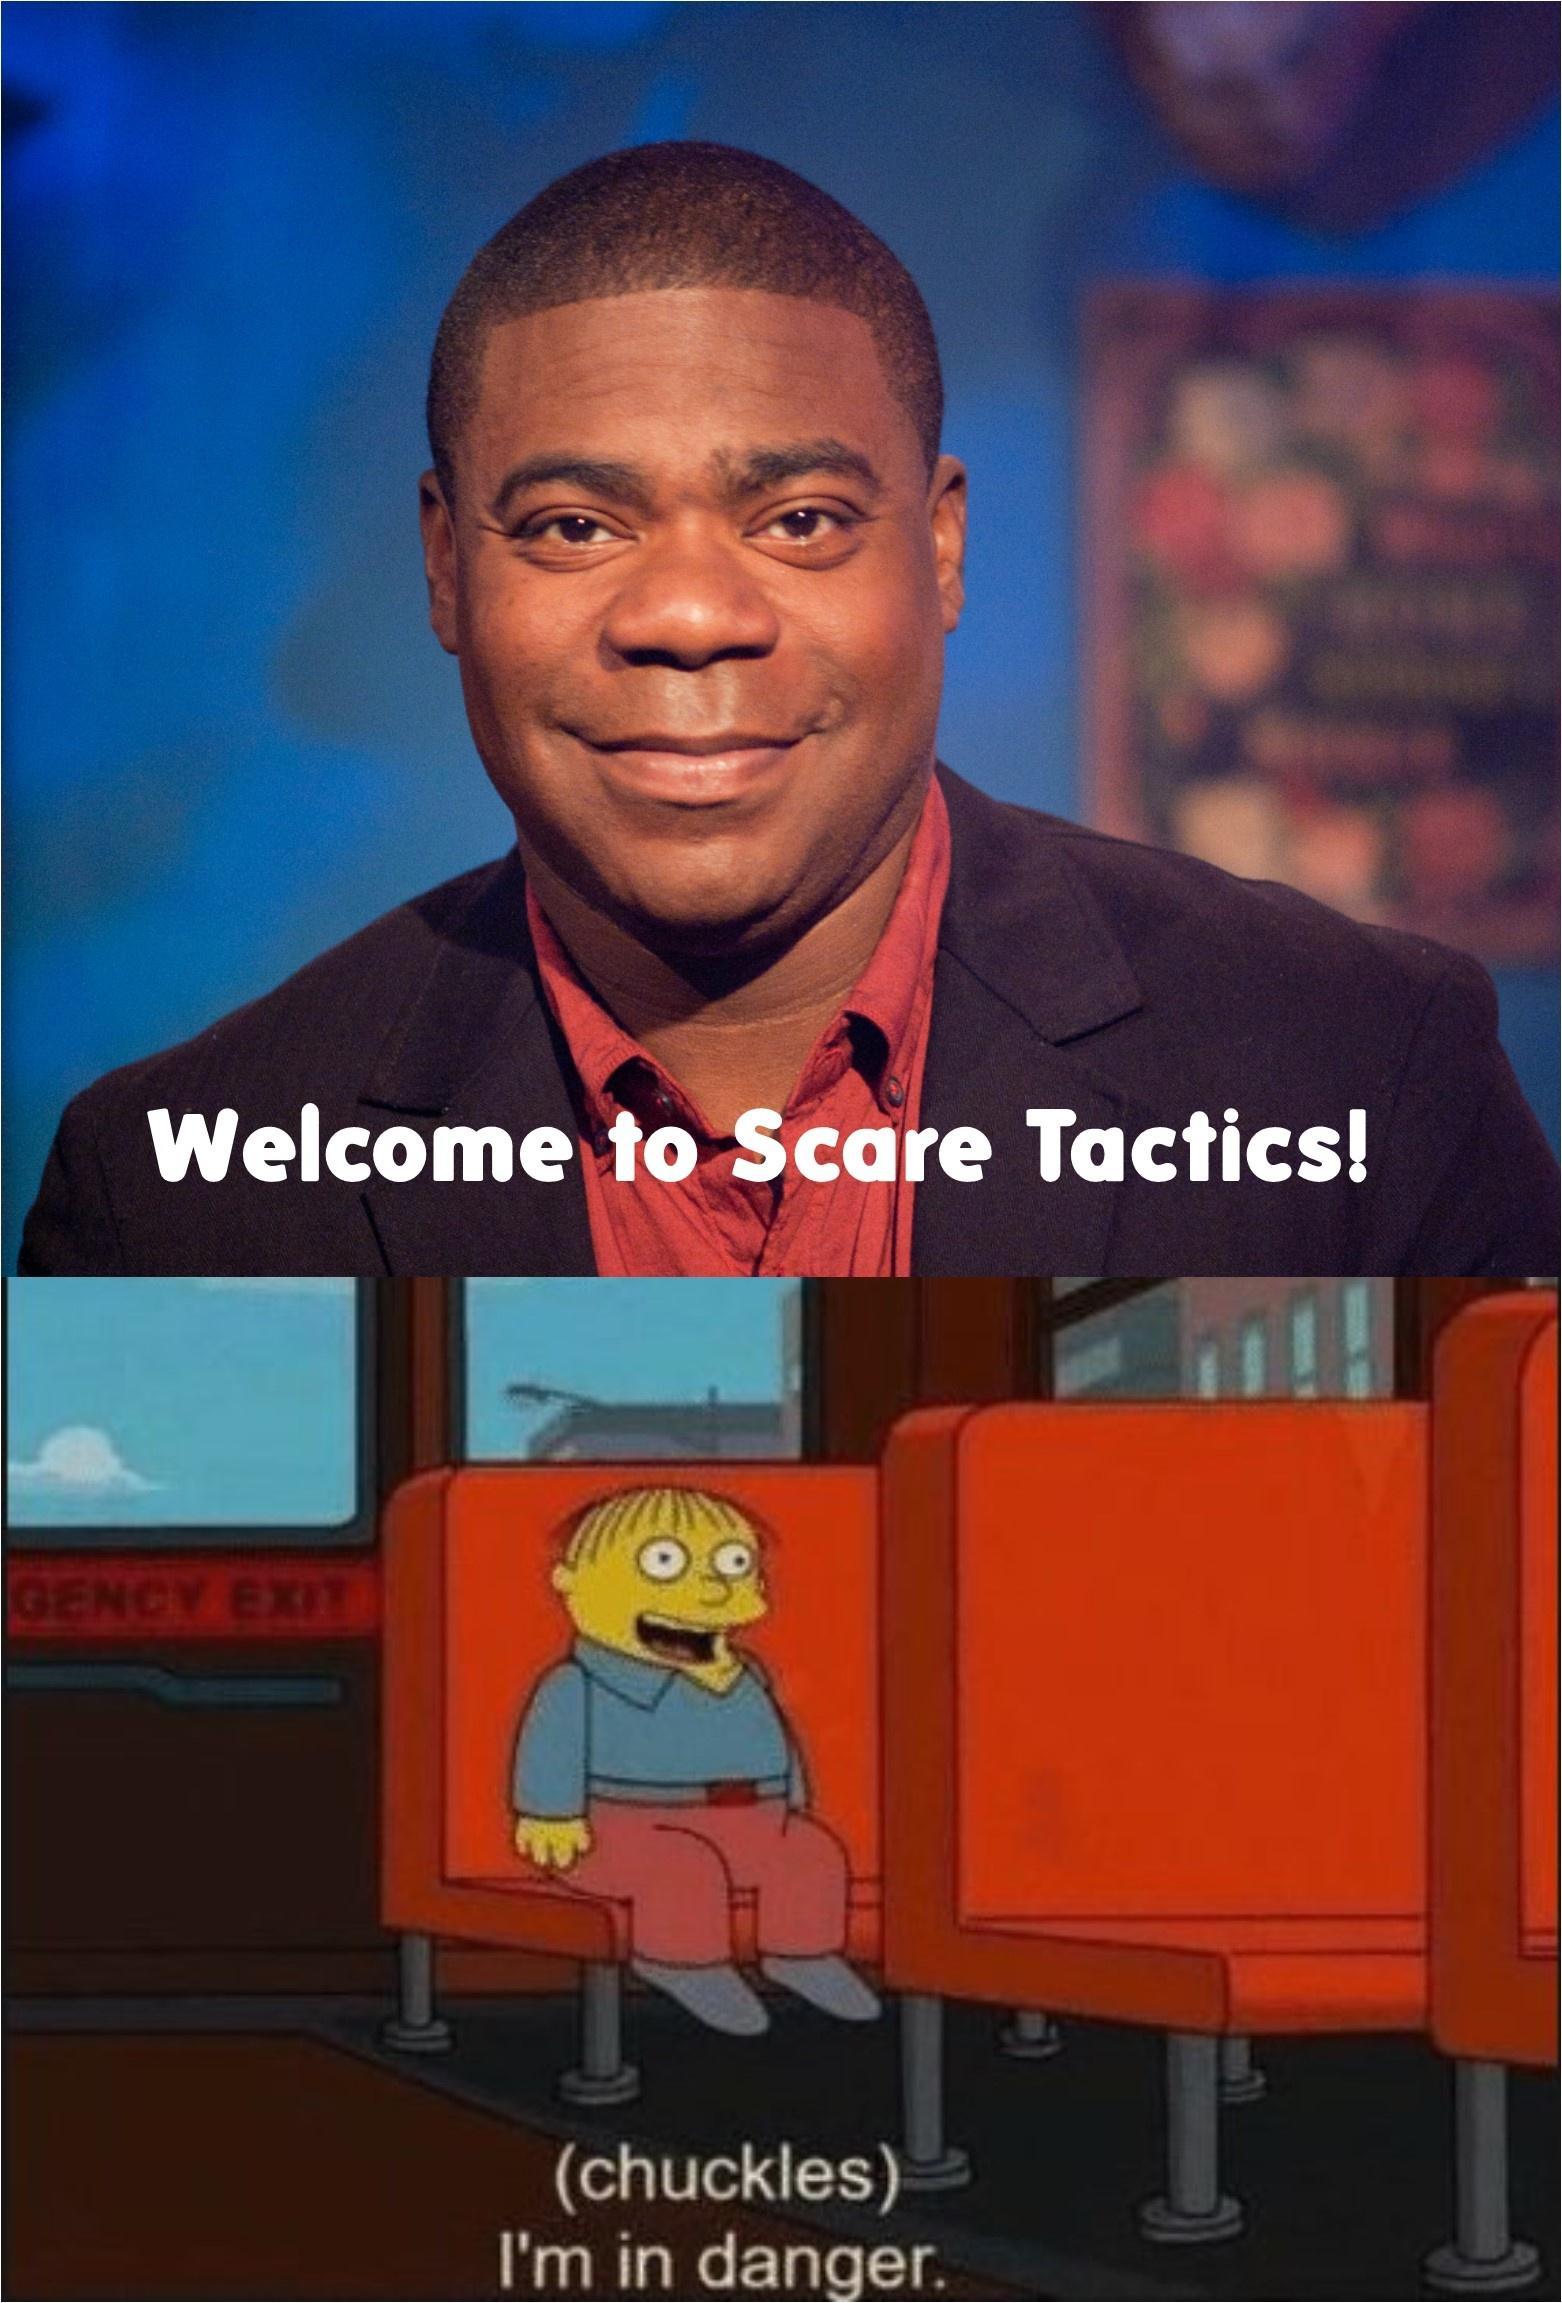 scaretactics netflix mtv areyouscared